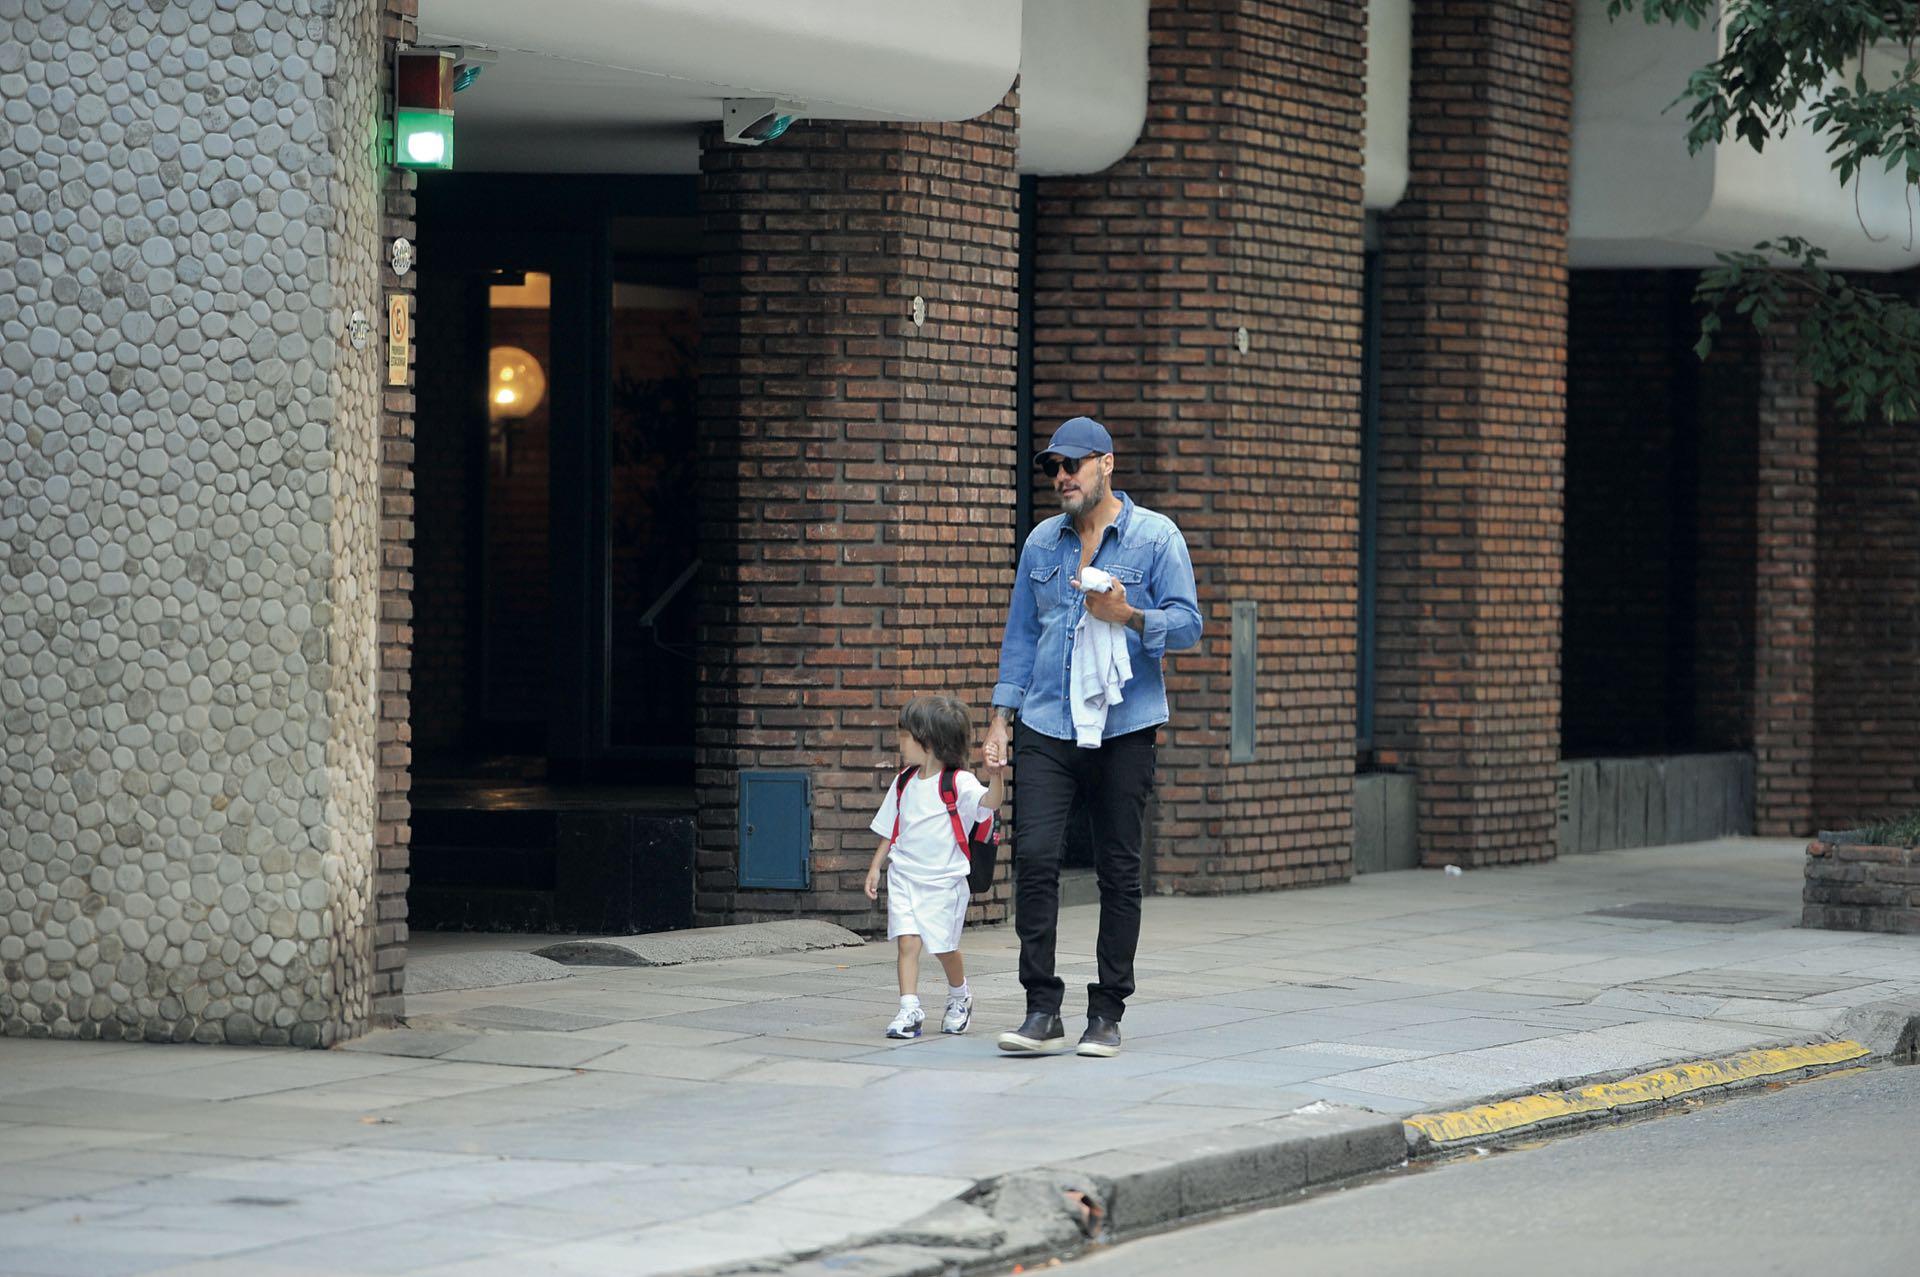 Caminata de padre e hijo.(Fotos: Julio César Ruíz)